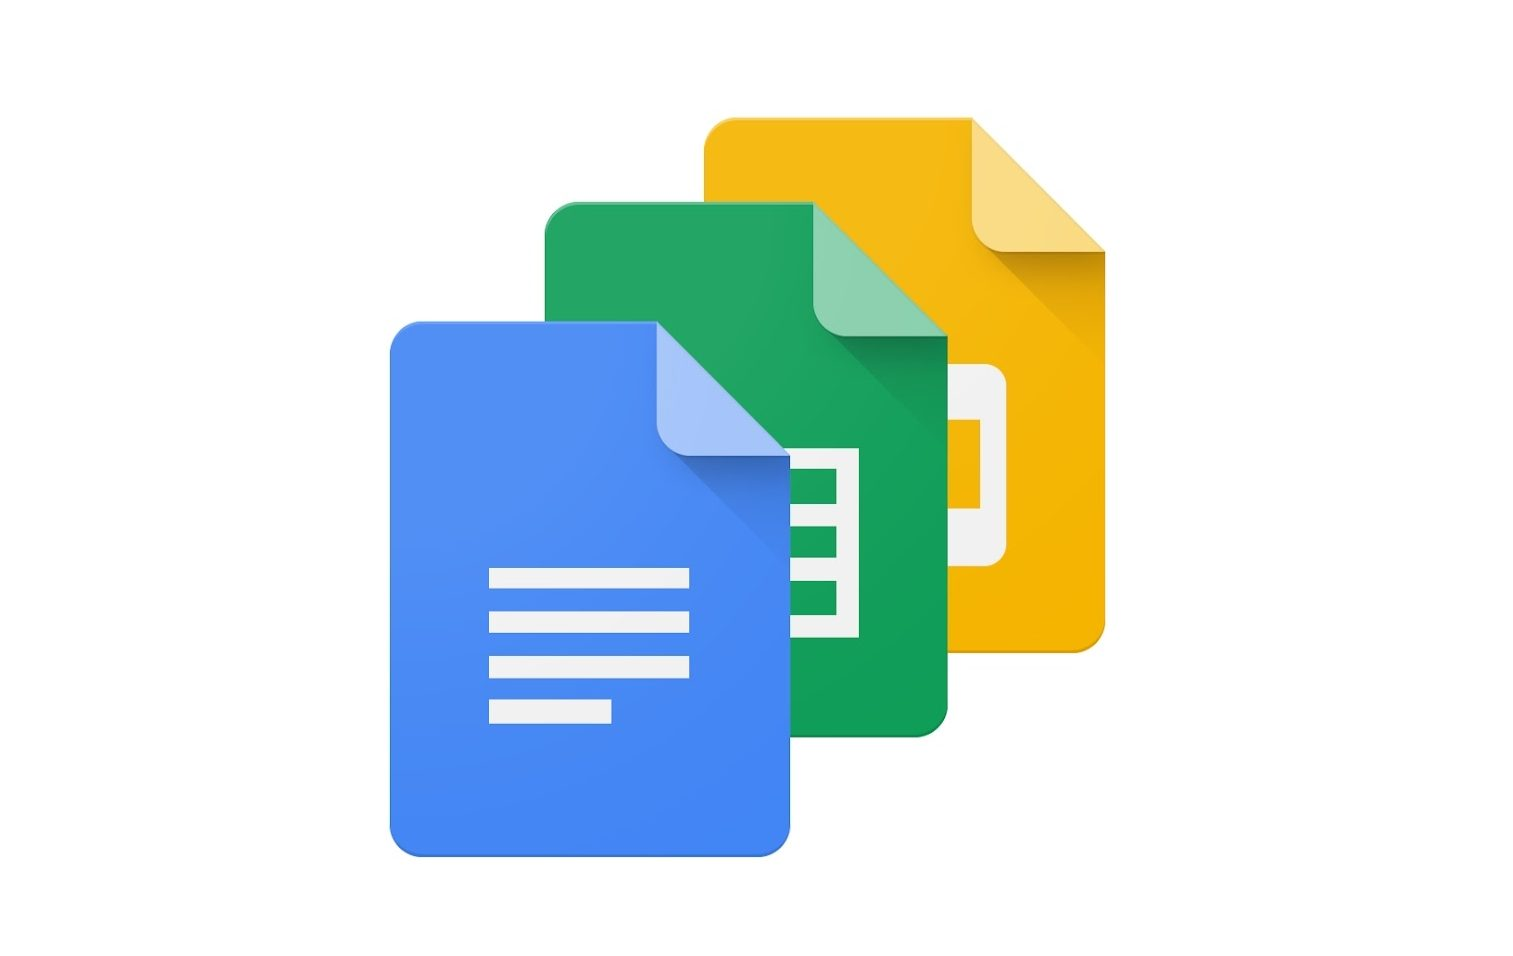 Google Docs, Sheets, Slides